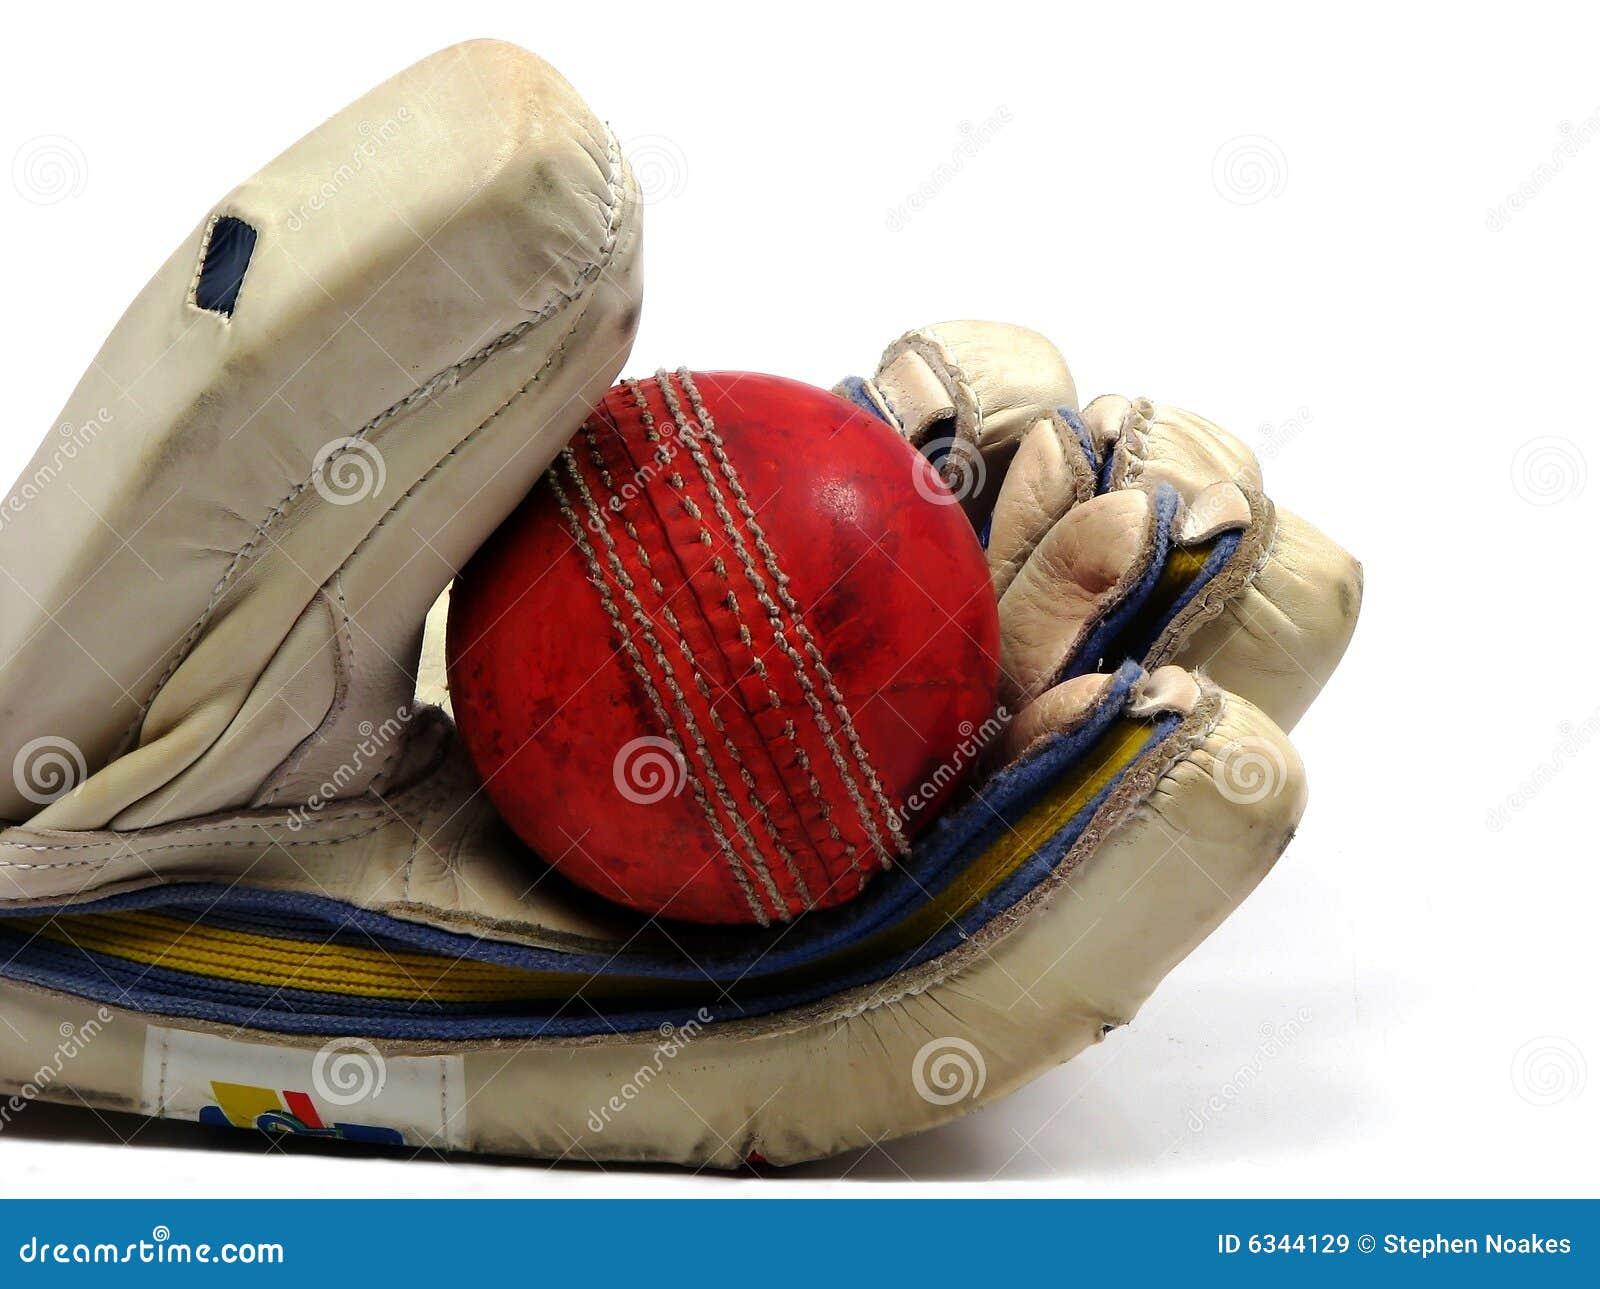 Glove holding cricket ball